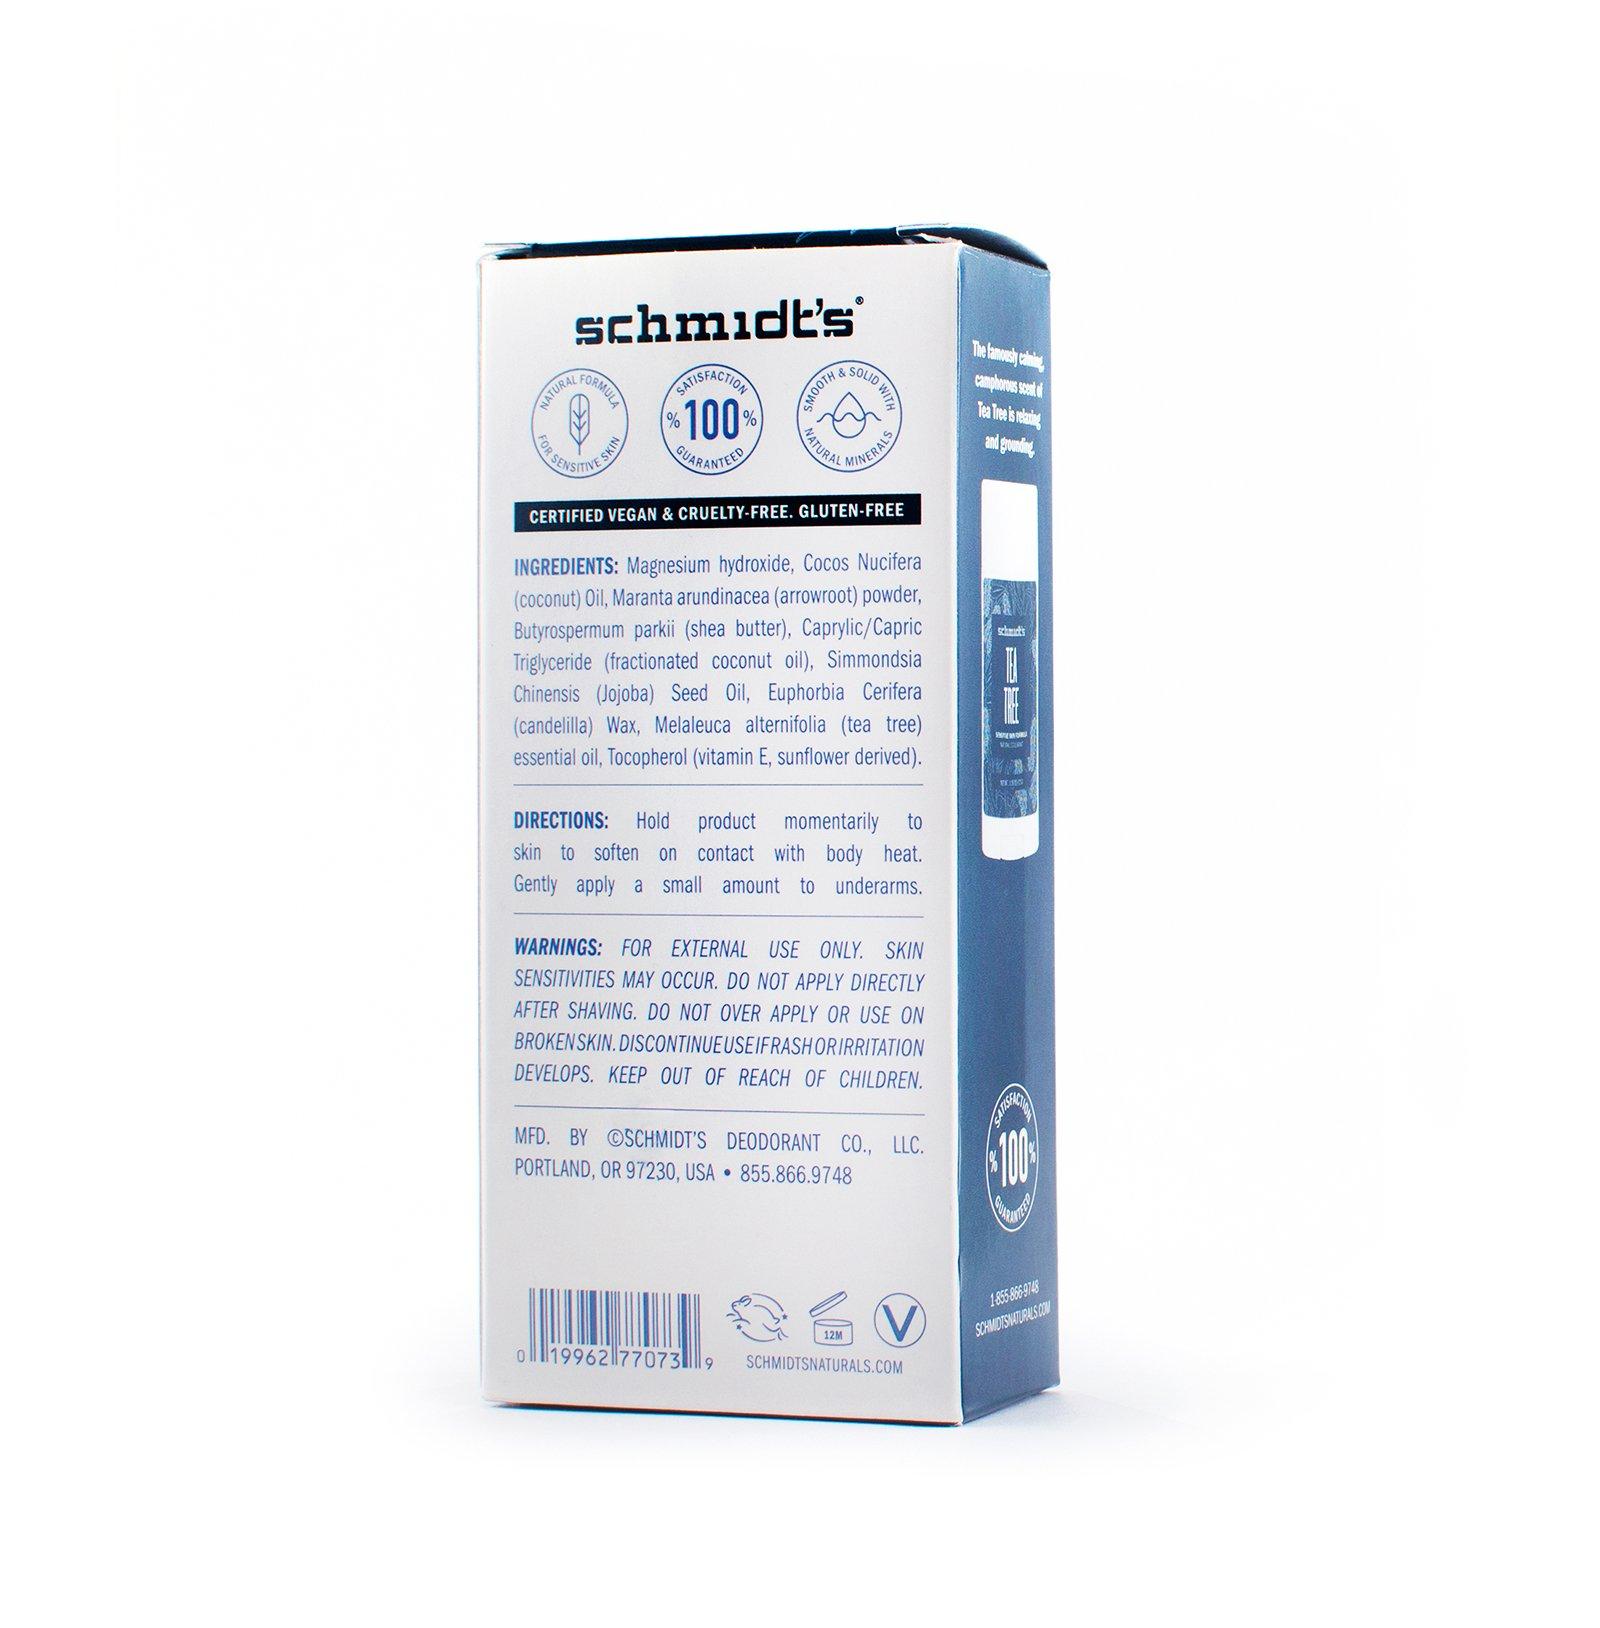 Schmidt's Natural Deodorant for Sensitive Skin - Tea Tree, 3.25 ounces. Stick for Women and Men by Schmidt's Deodorant (Image #3)